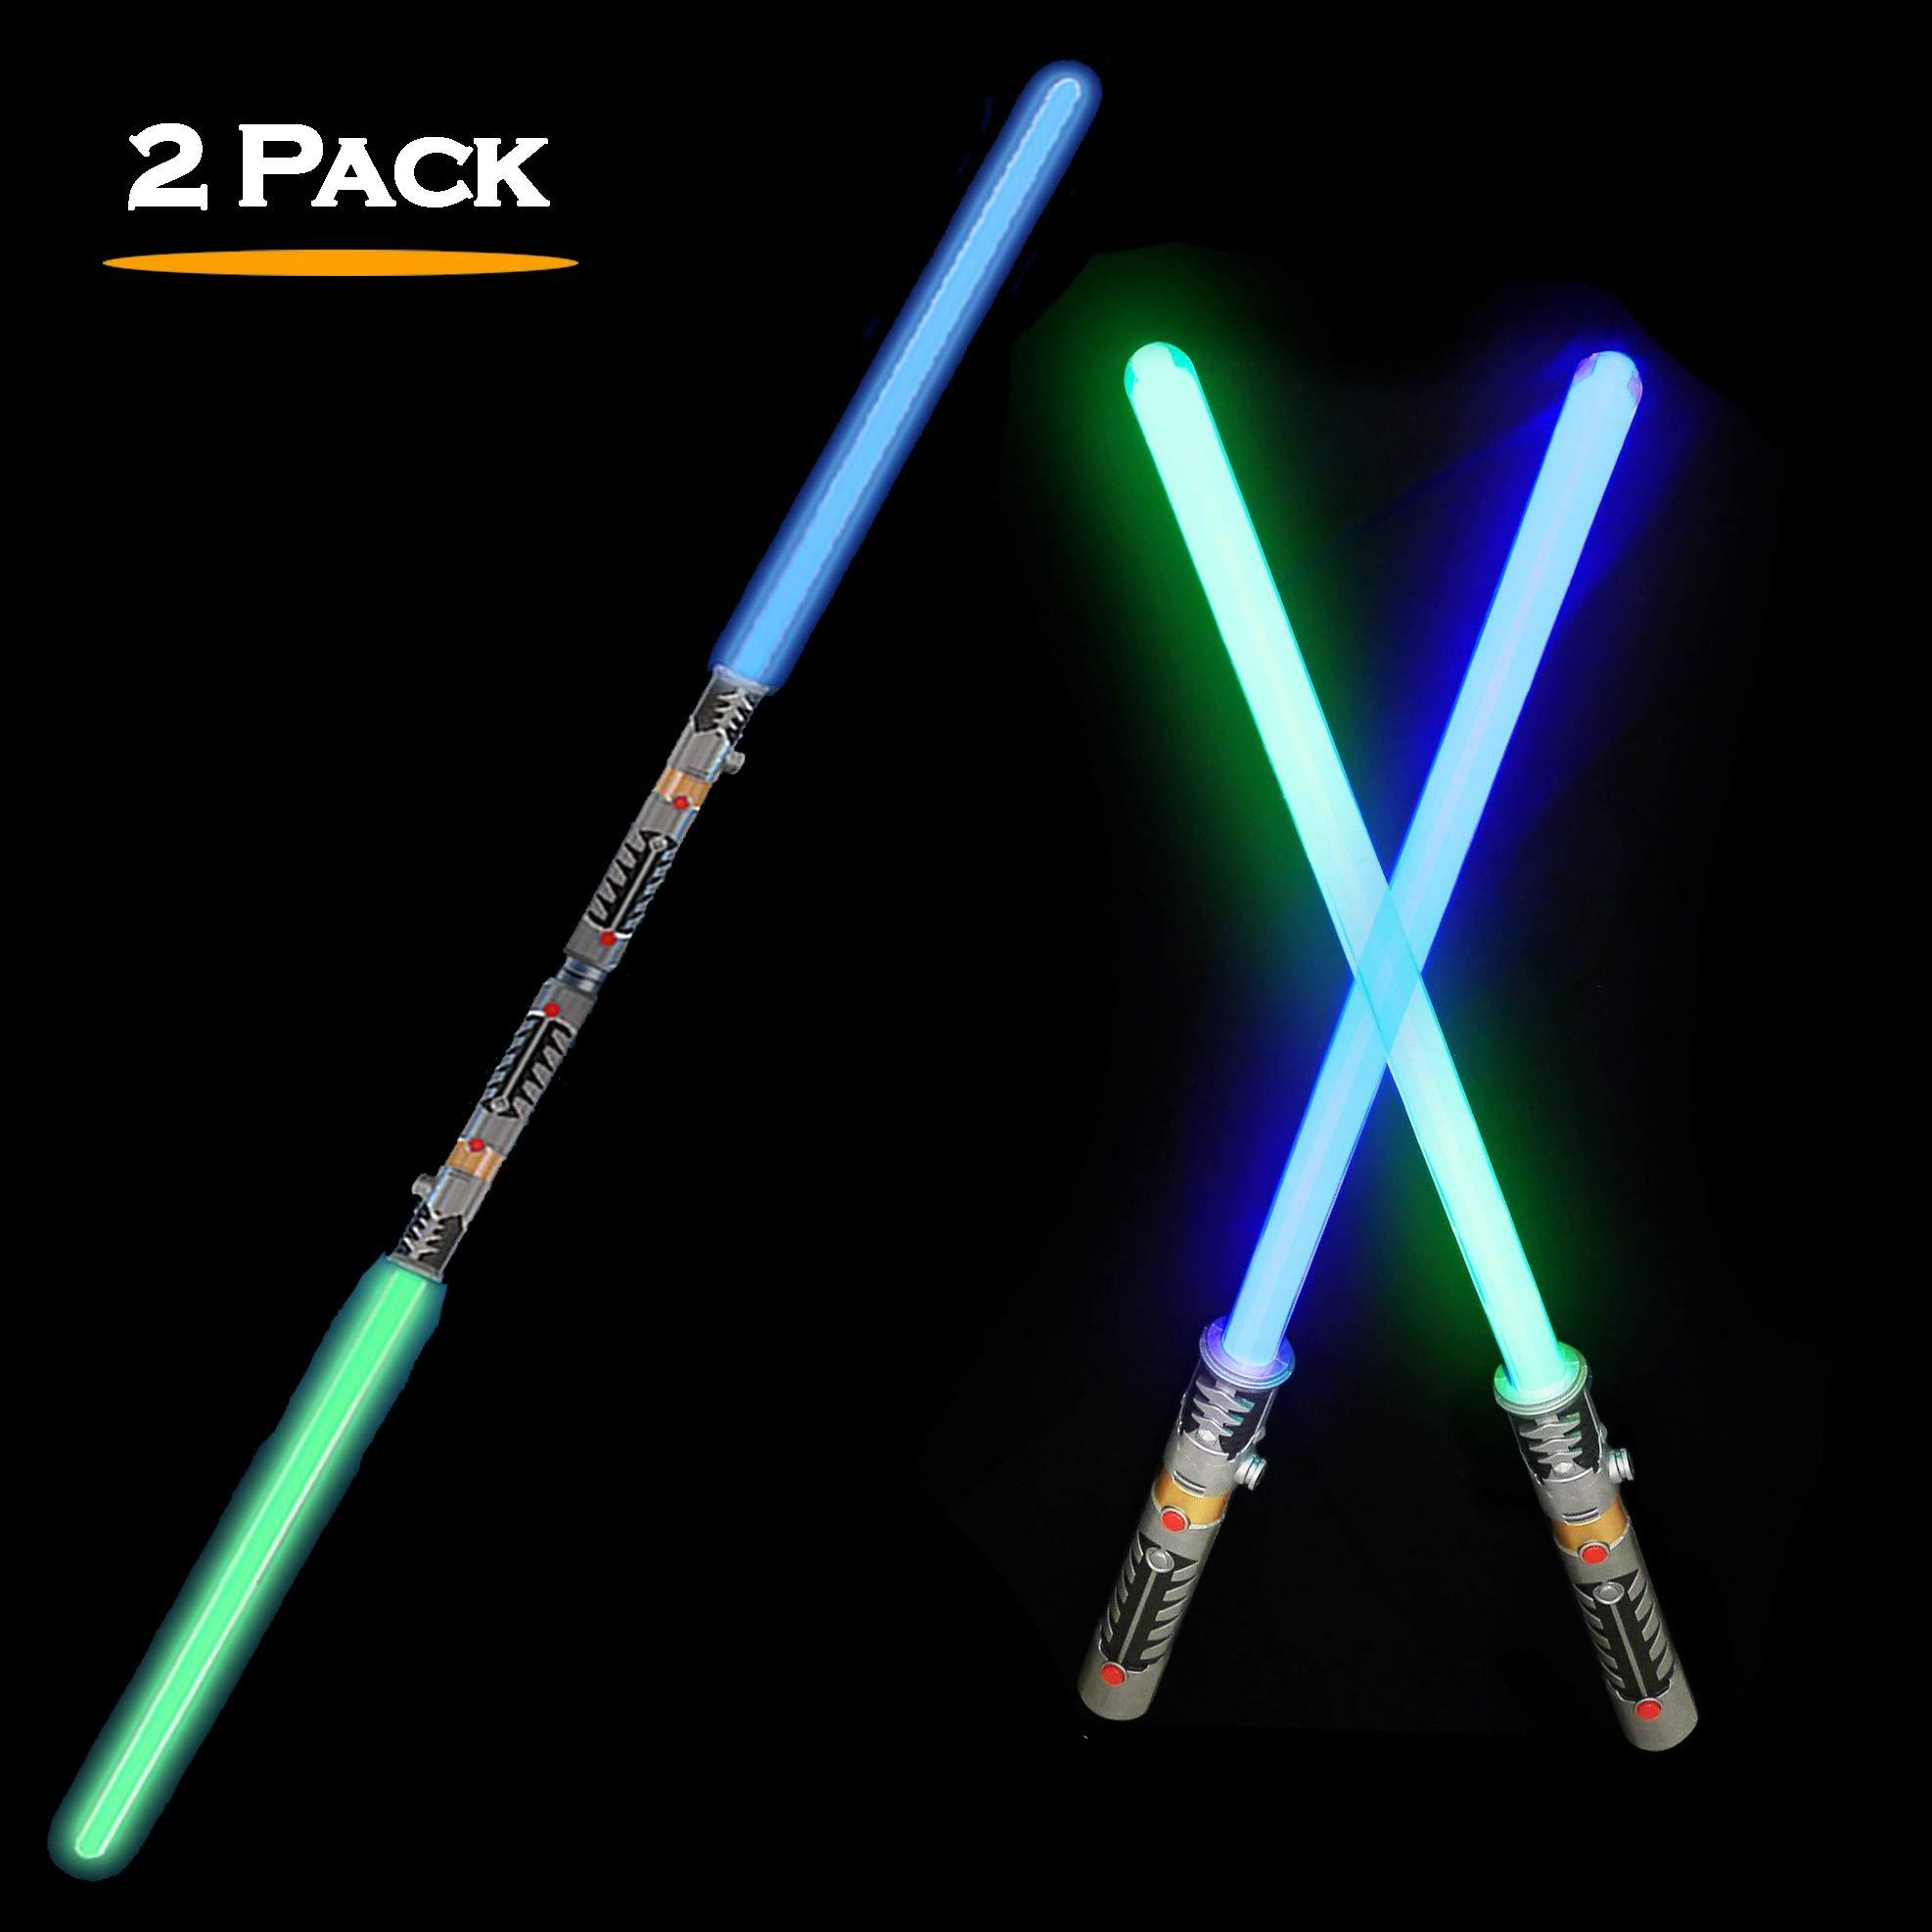 6 NEW LIGHT UP GLITTER LED SABER SWORD light up kids play toy PLAY boy swords